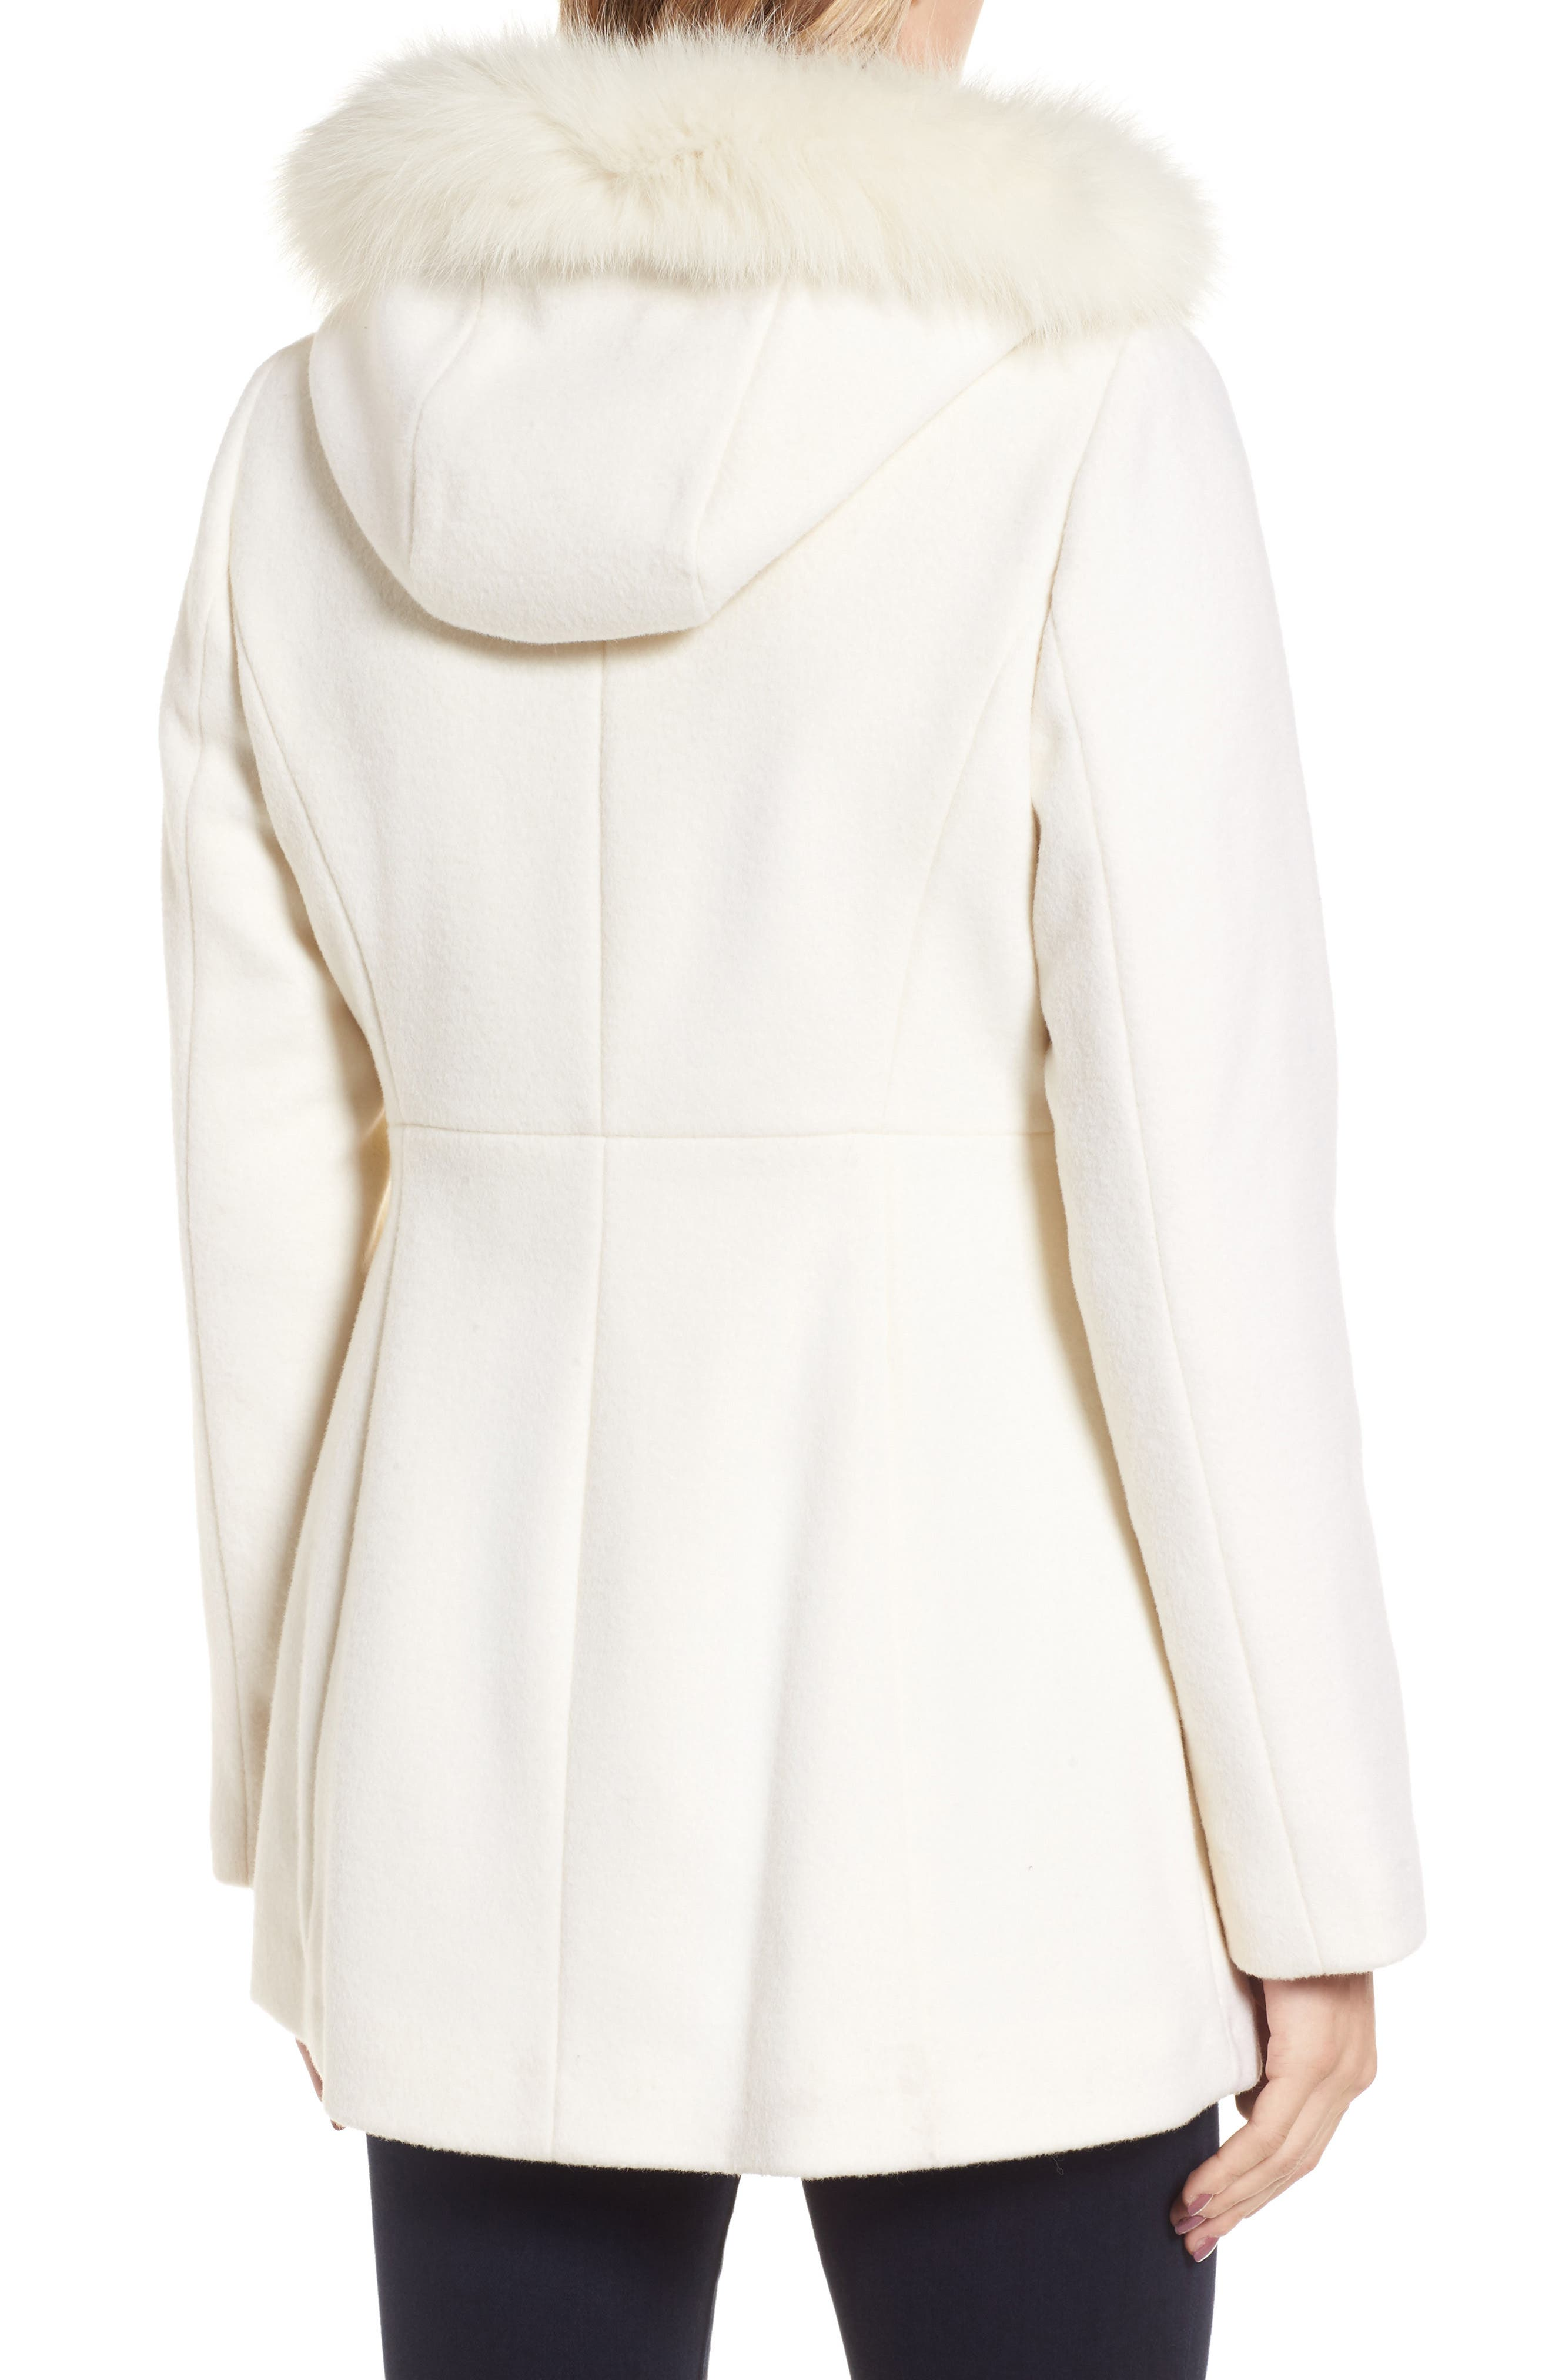 Women's SACHI Coats & Jackets | Nordstrom